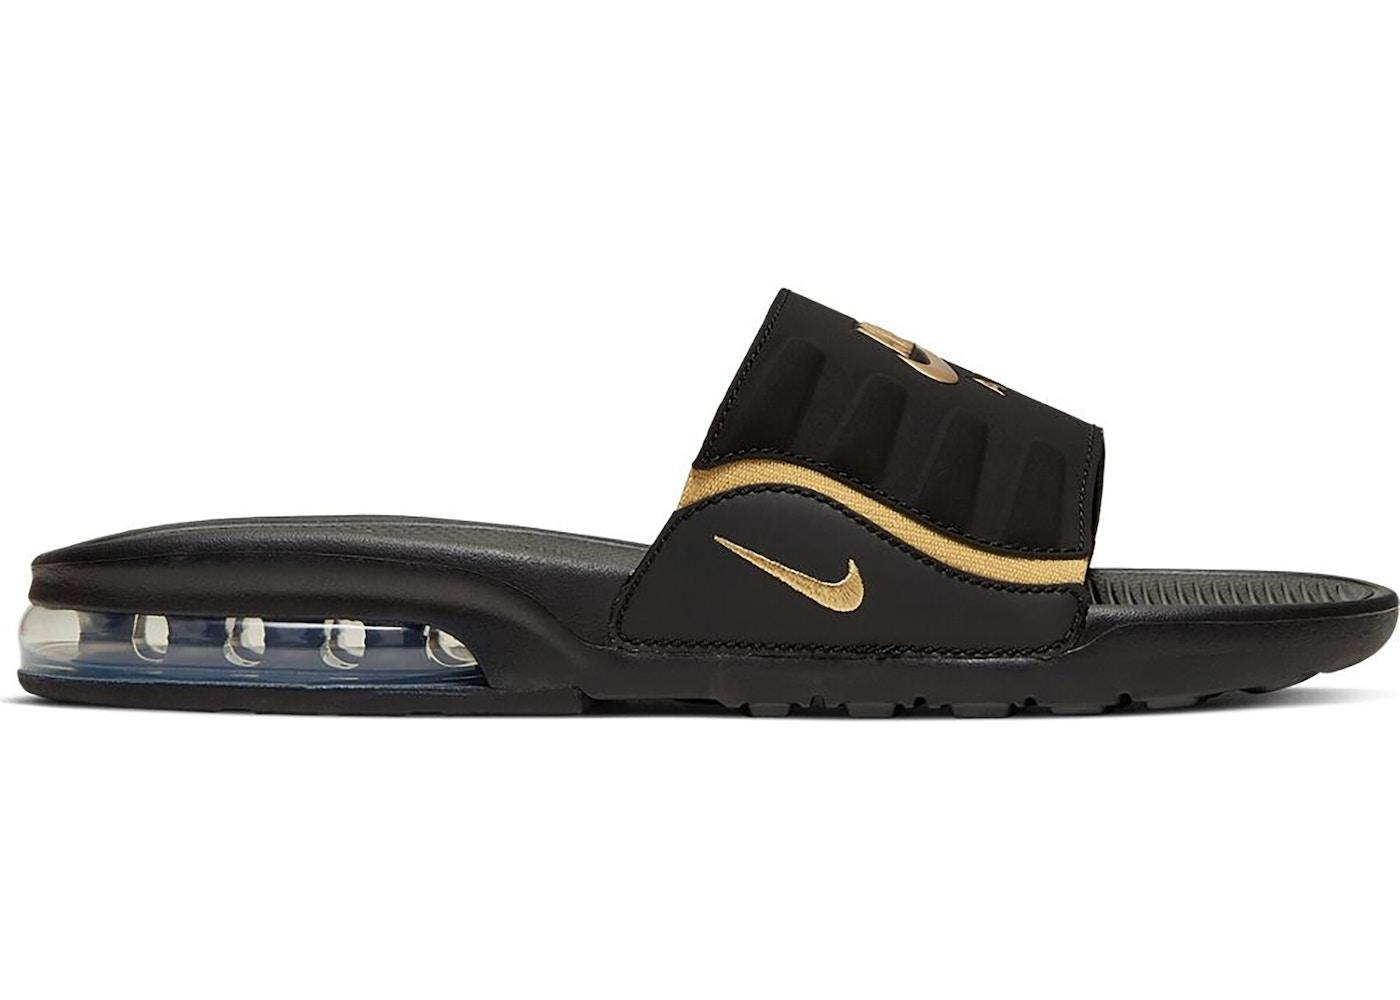 Nike Air Max Camden Black Metallic Gold (W) - BQ4633-001